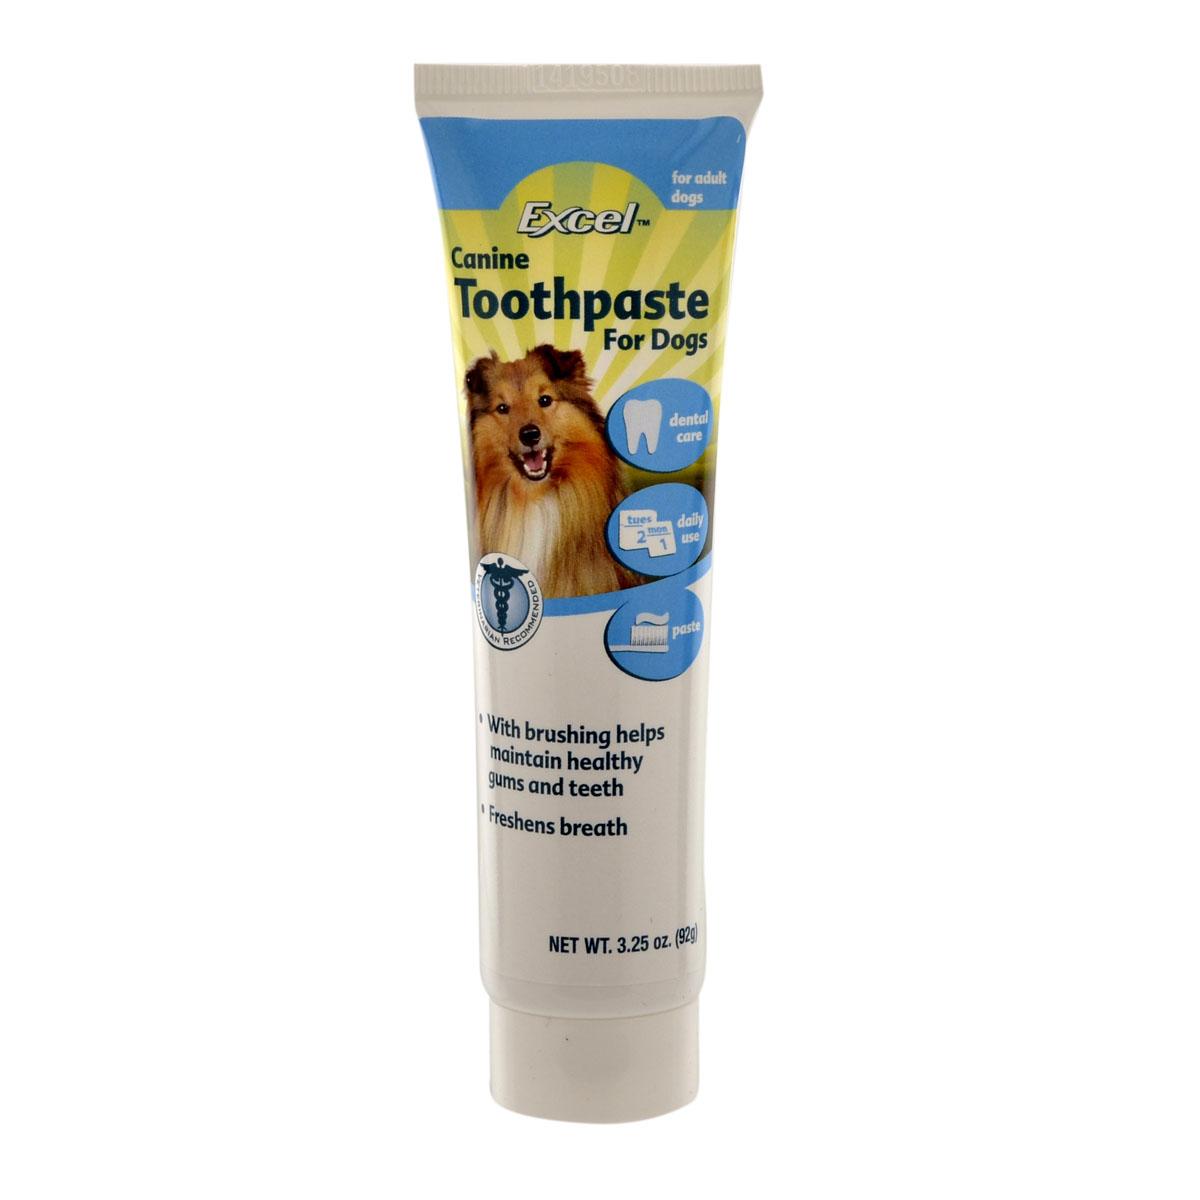 Зубная паста для собак 8in1 Excel Canine Toothpaste свежее дыхание 92 г